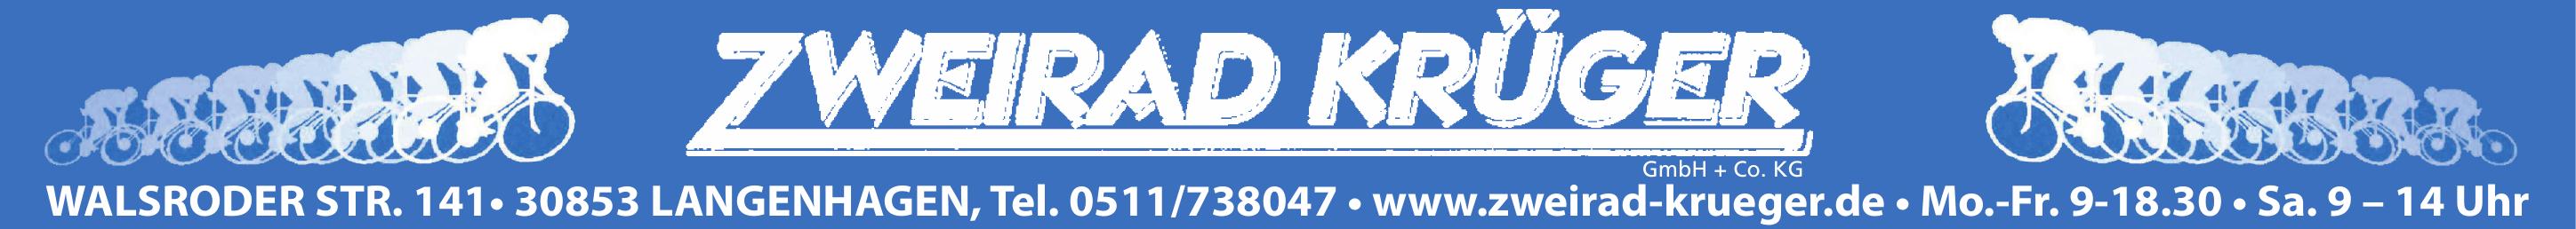 Zweirad Krüger GmbH + Co. KG